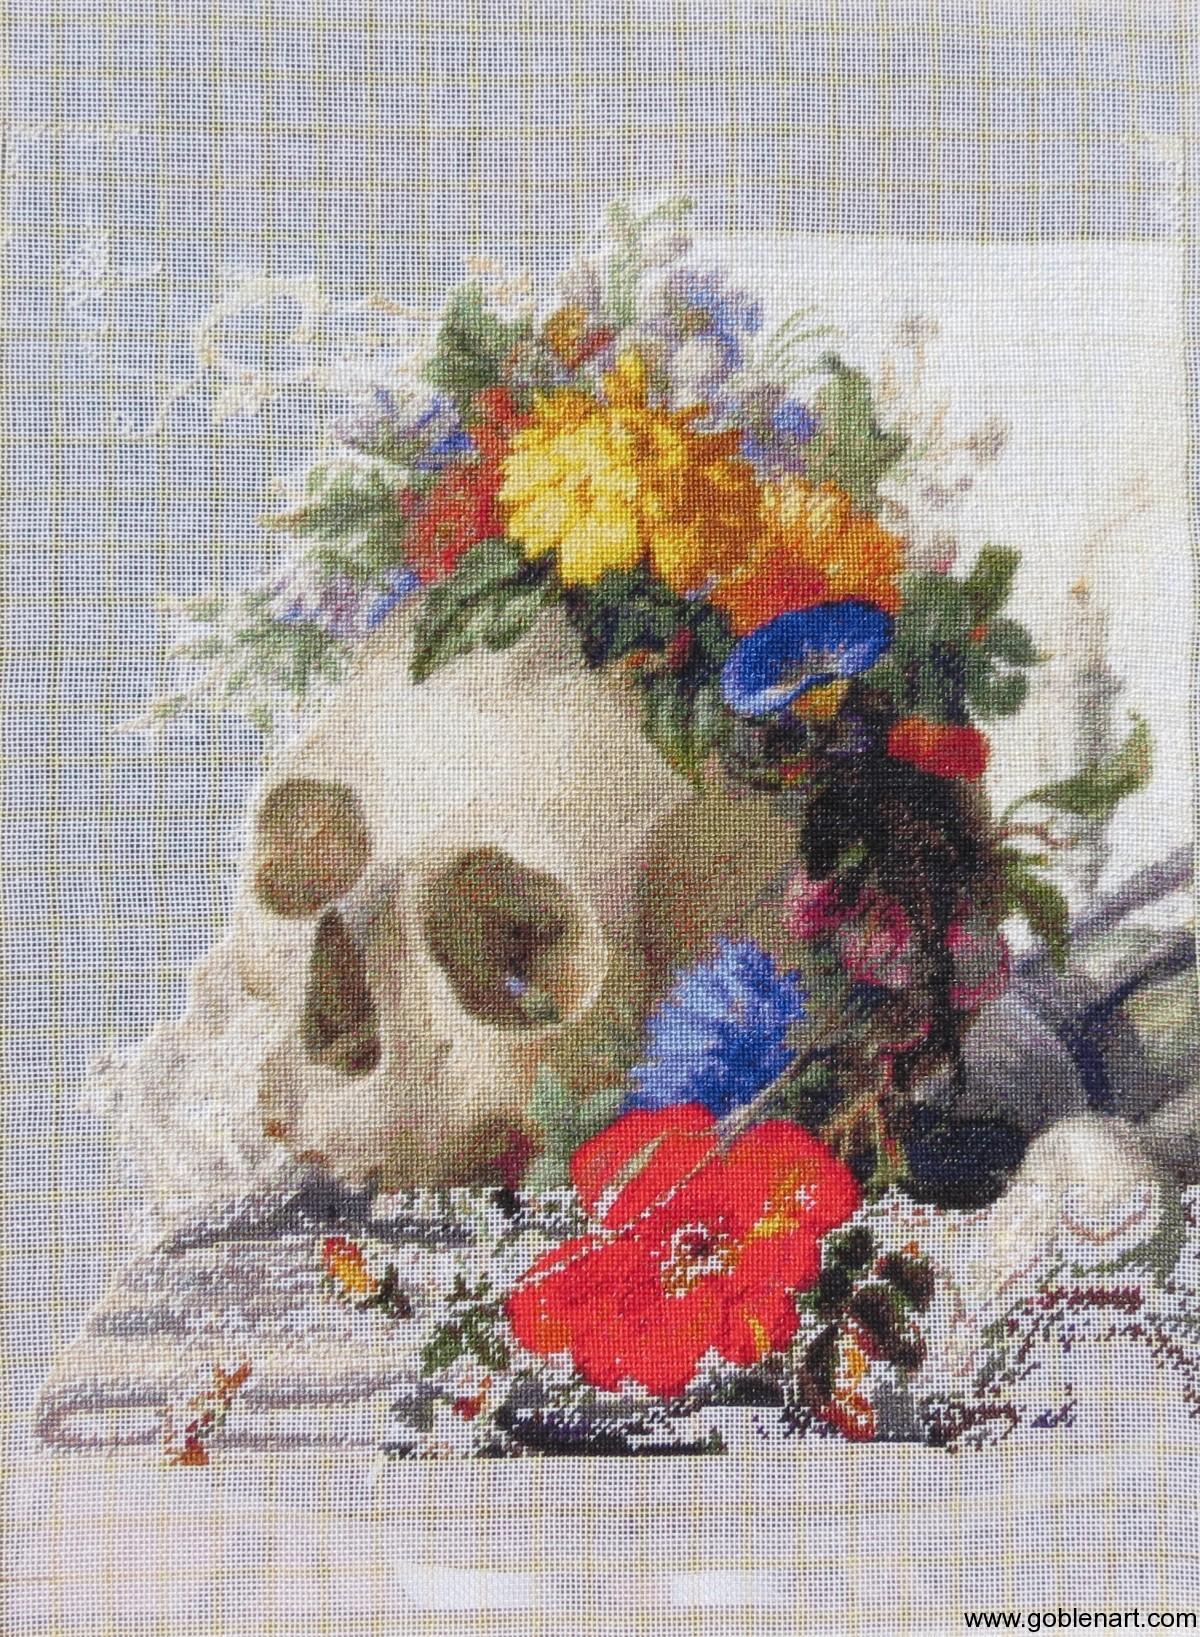 Vanitas Still Life 2 - Herman Henstenburgh